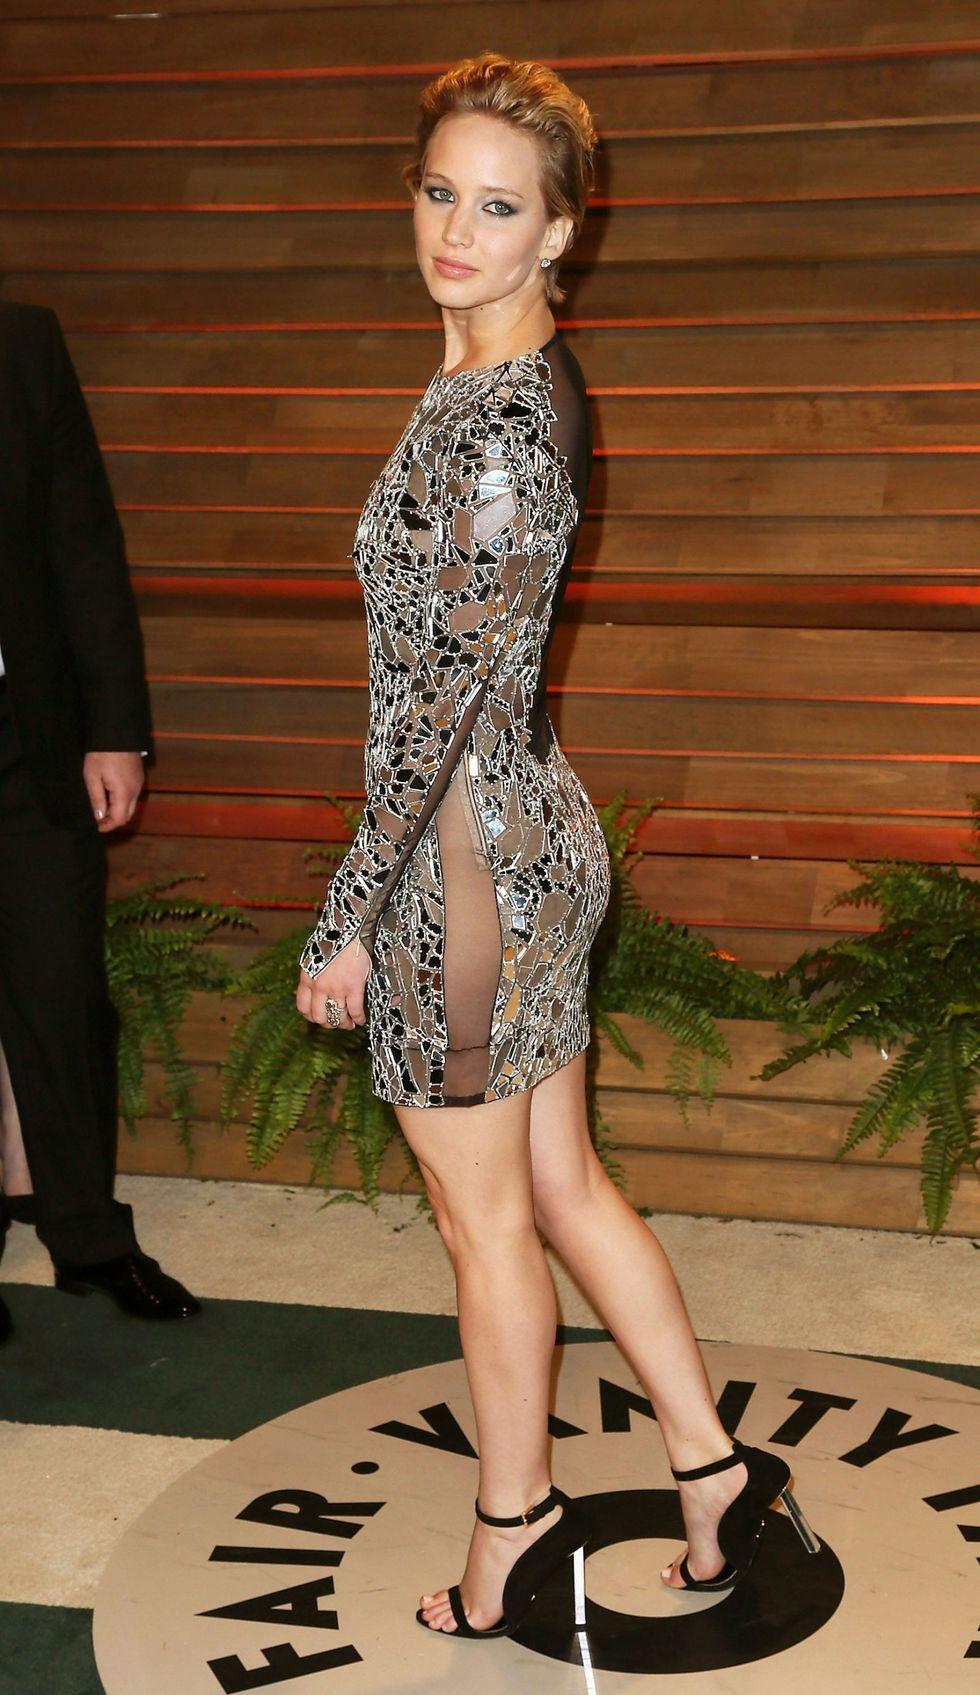 Exit magazine,Chandra davis leaked Hot photos Nicole melrose,Ass Flash Photos of Alicia Arden. 2018-2019 celebrityes photos leaks!